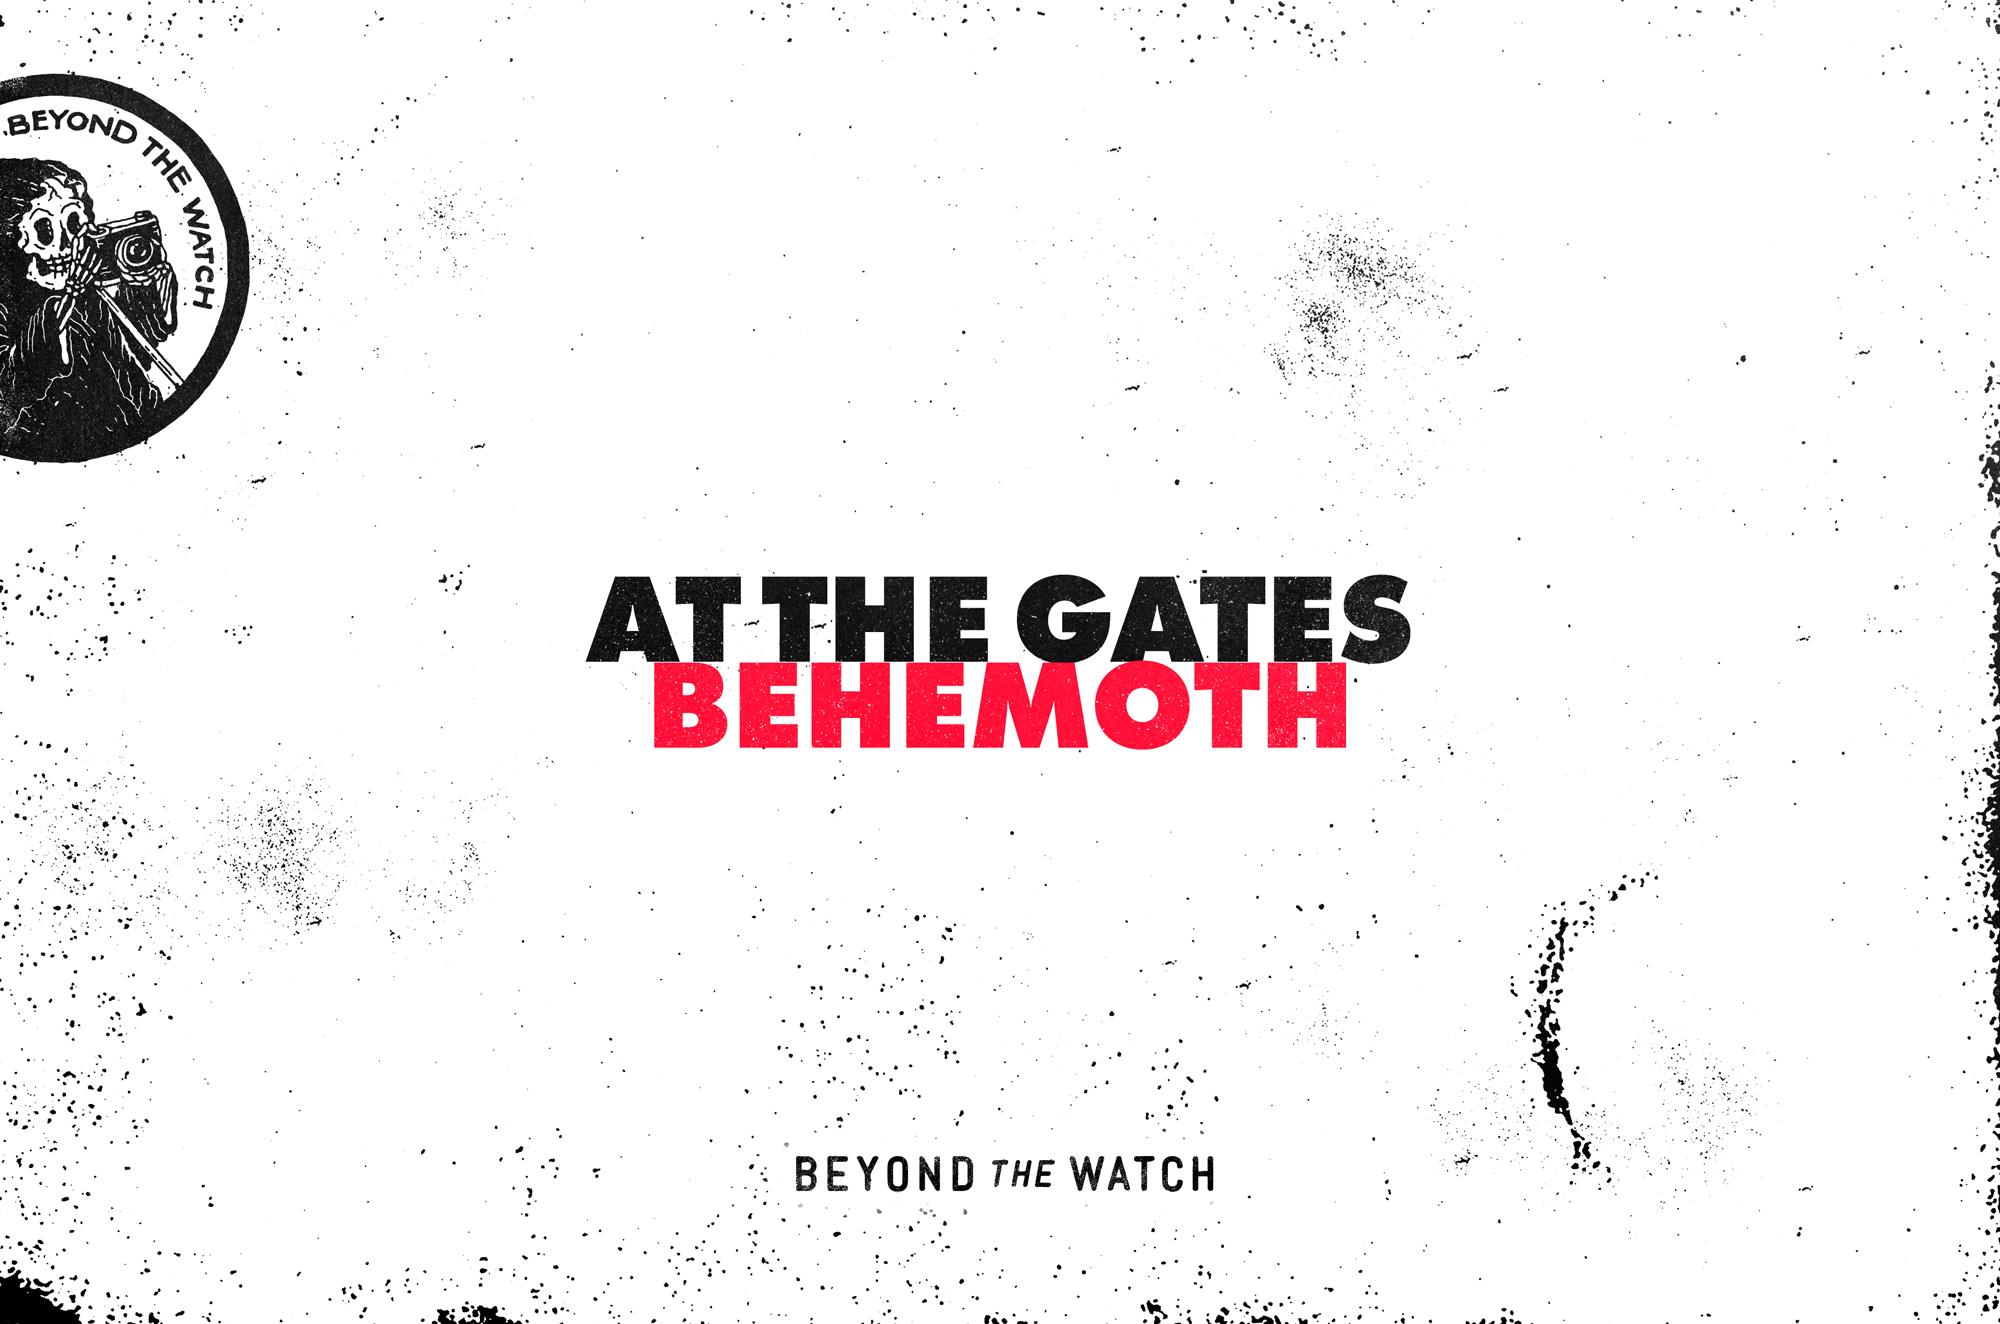 AtTheGates-Behemoth.jpg